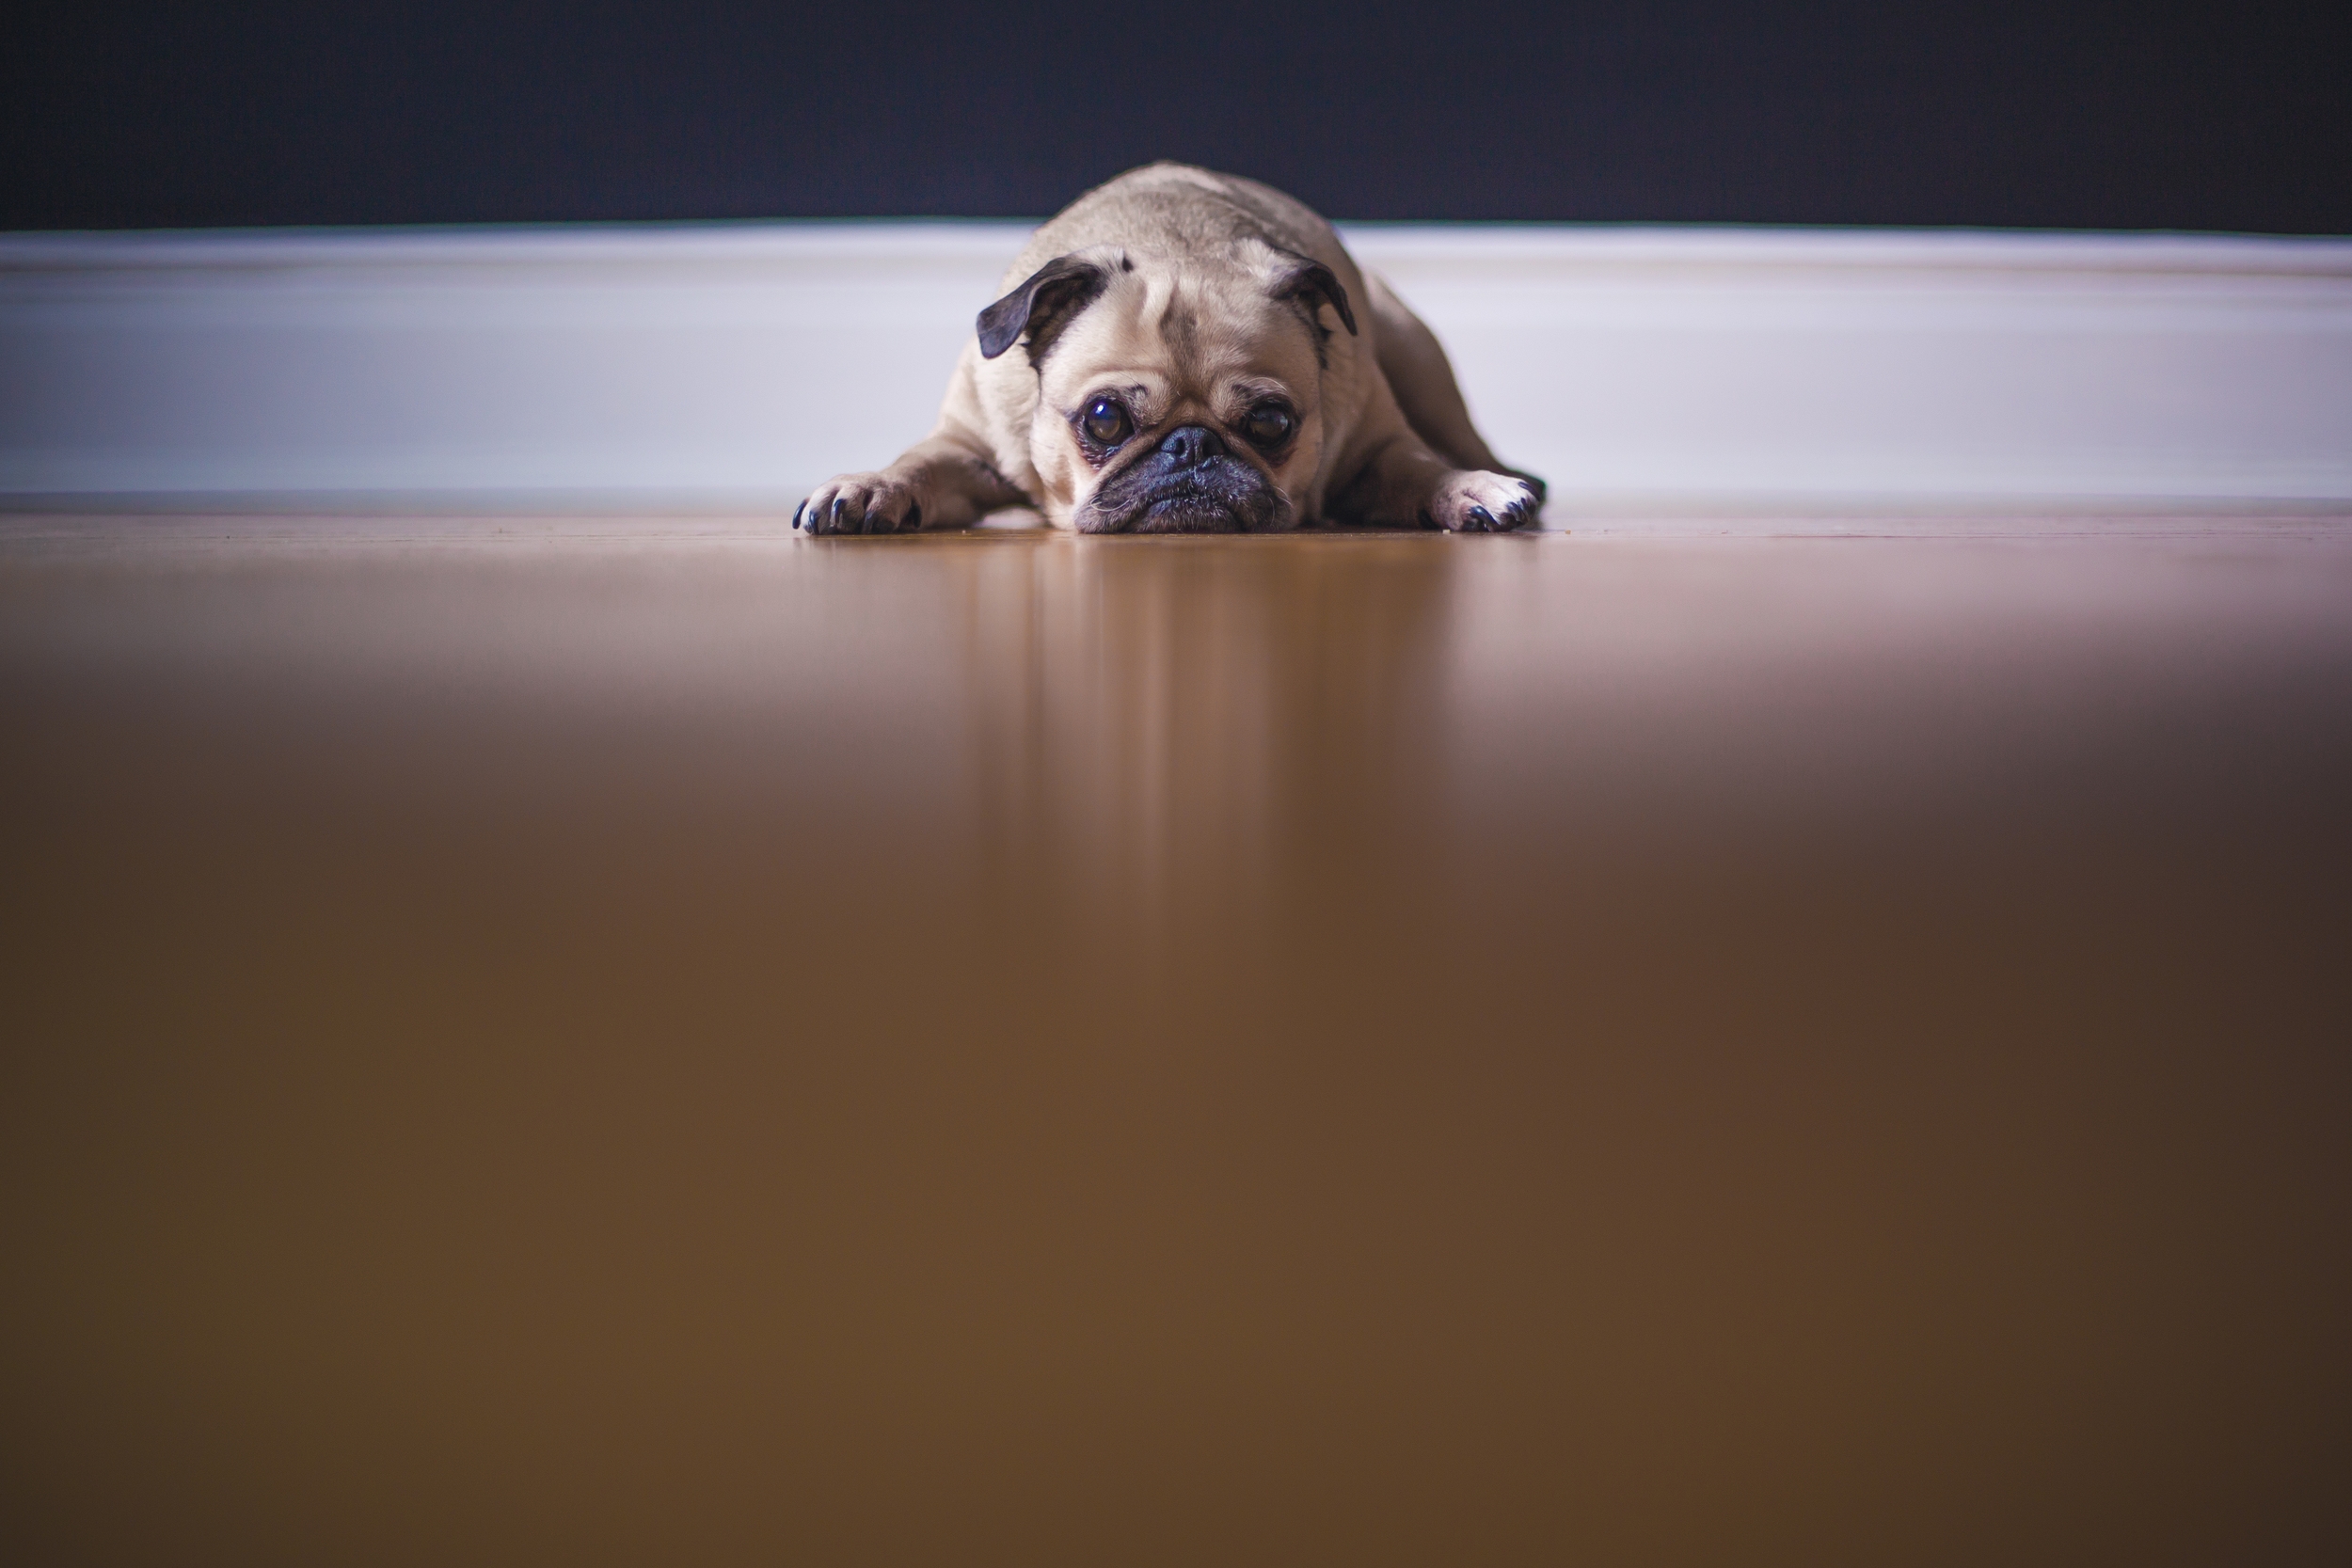 If you don't get a baseline viral load, Max will be sad. Don't make Max sad.